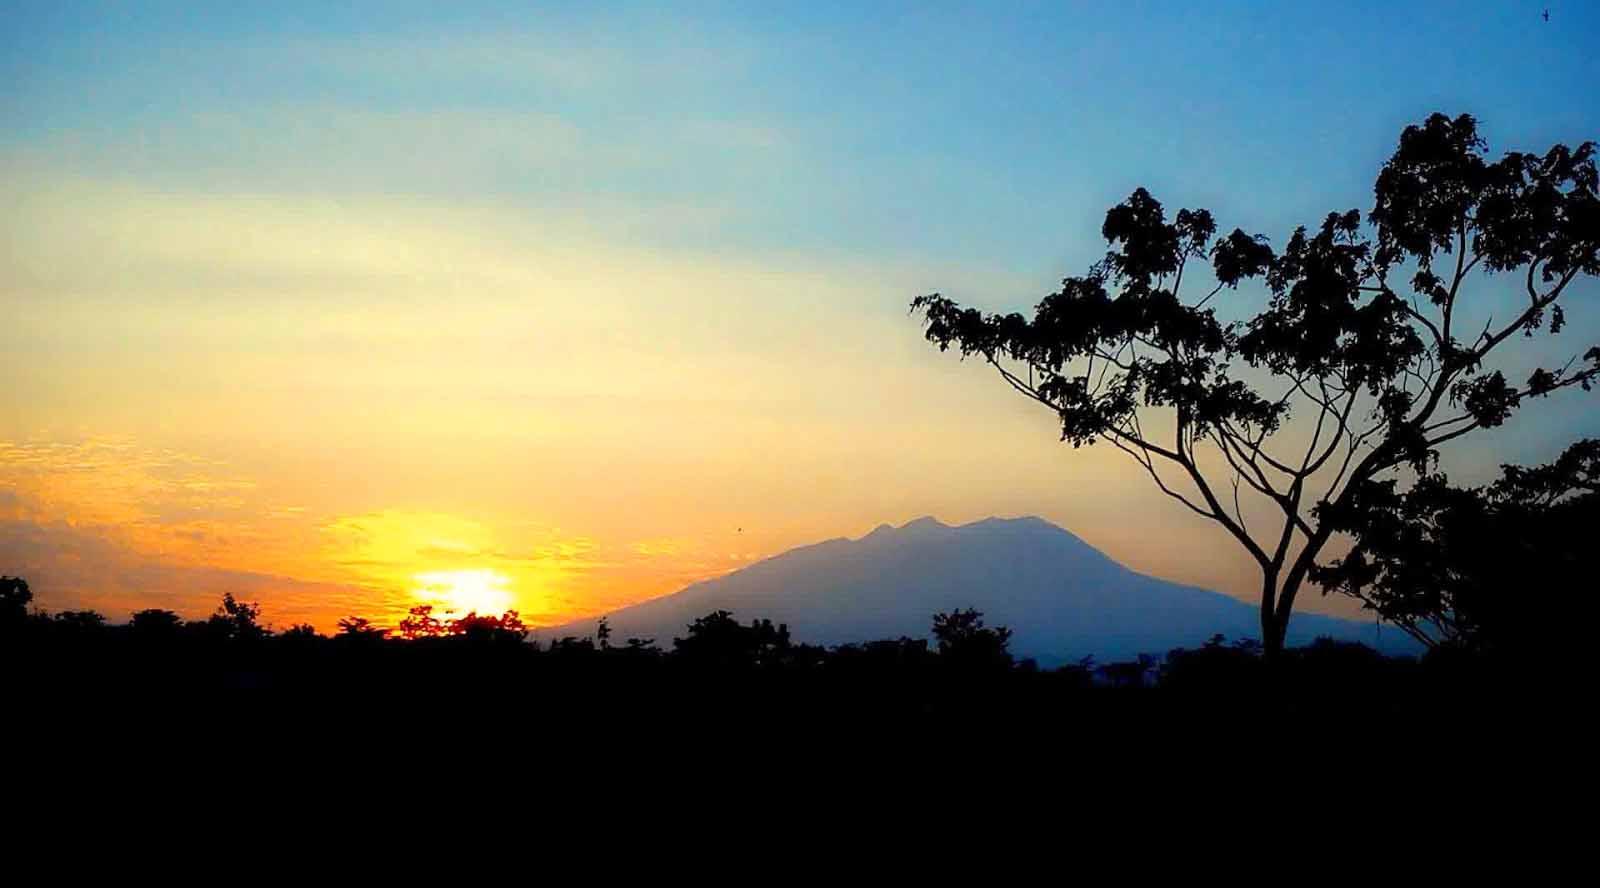 gunung lawu di jawa timur gunung lawu dan misterinya  eyang gunung lawu edelweis ungu gunung lawu evakuasi gunung lawu burung endemik gunung lawu ekspedisi gunung lawu eyang bancolono gunung lawu edelweis di gunung lawu